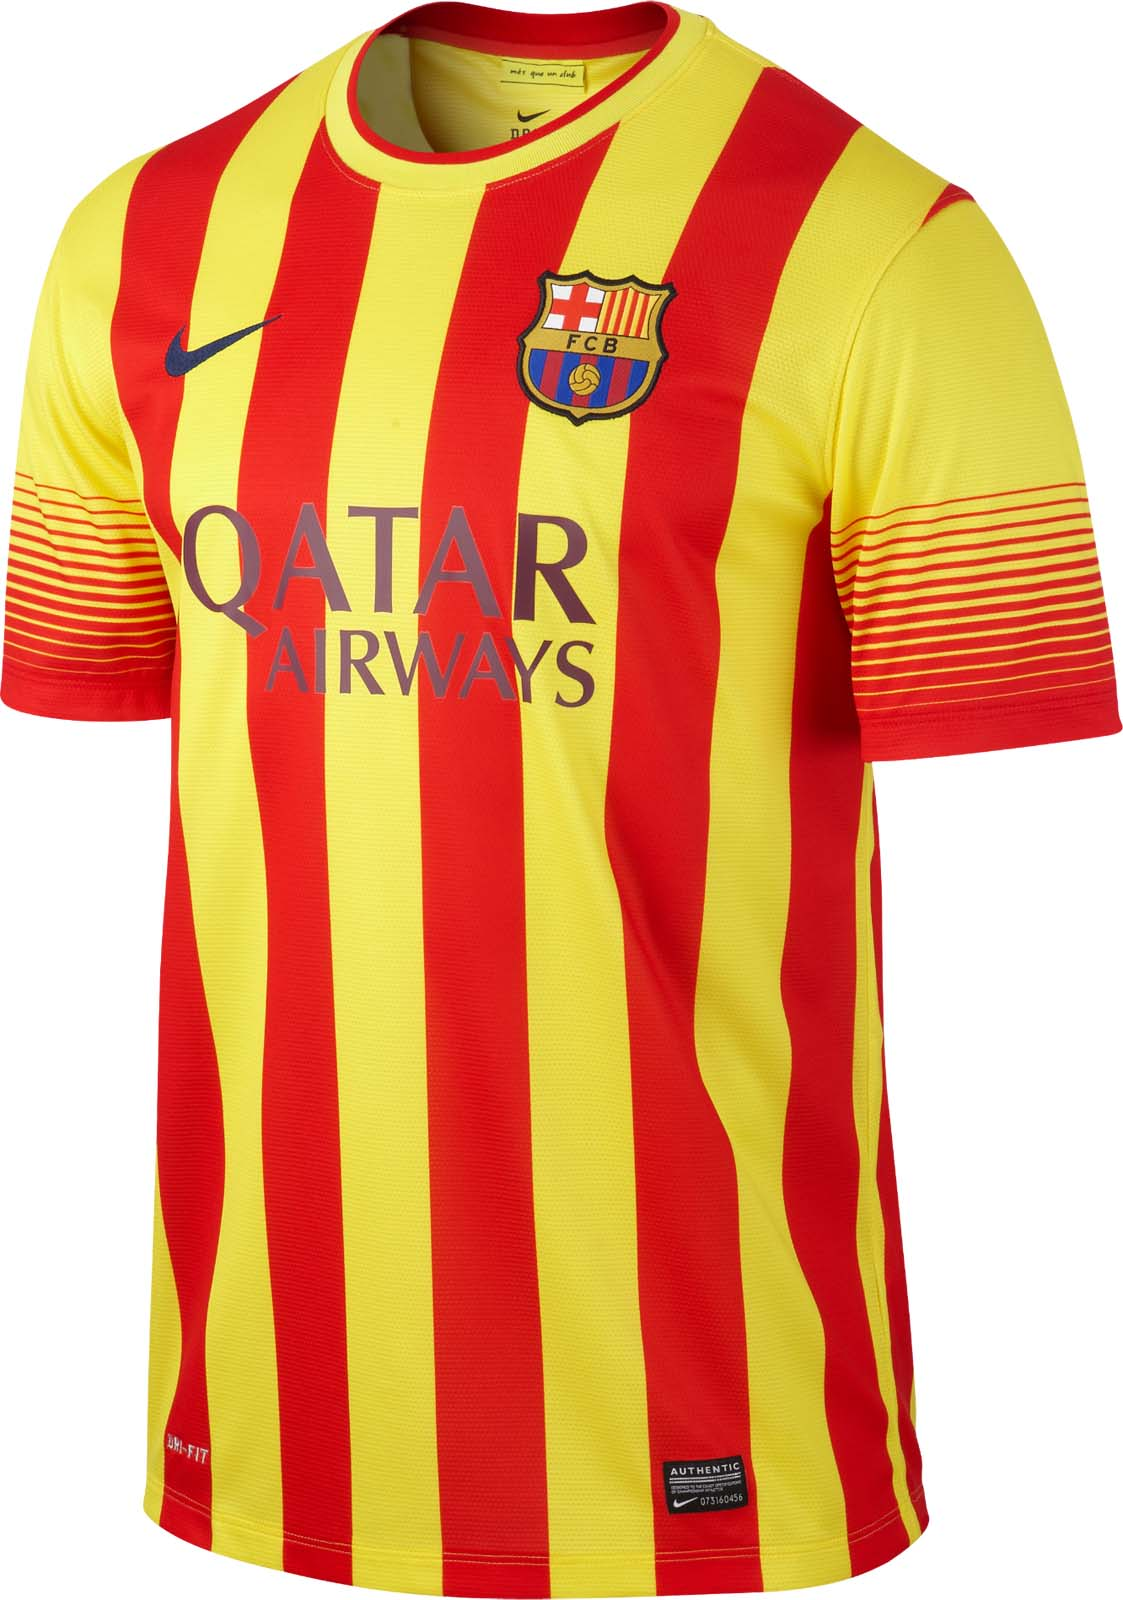 Barcelona To Play Liga Home Match In 39 Senyera 39 Kit Footy